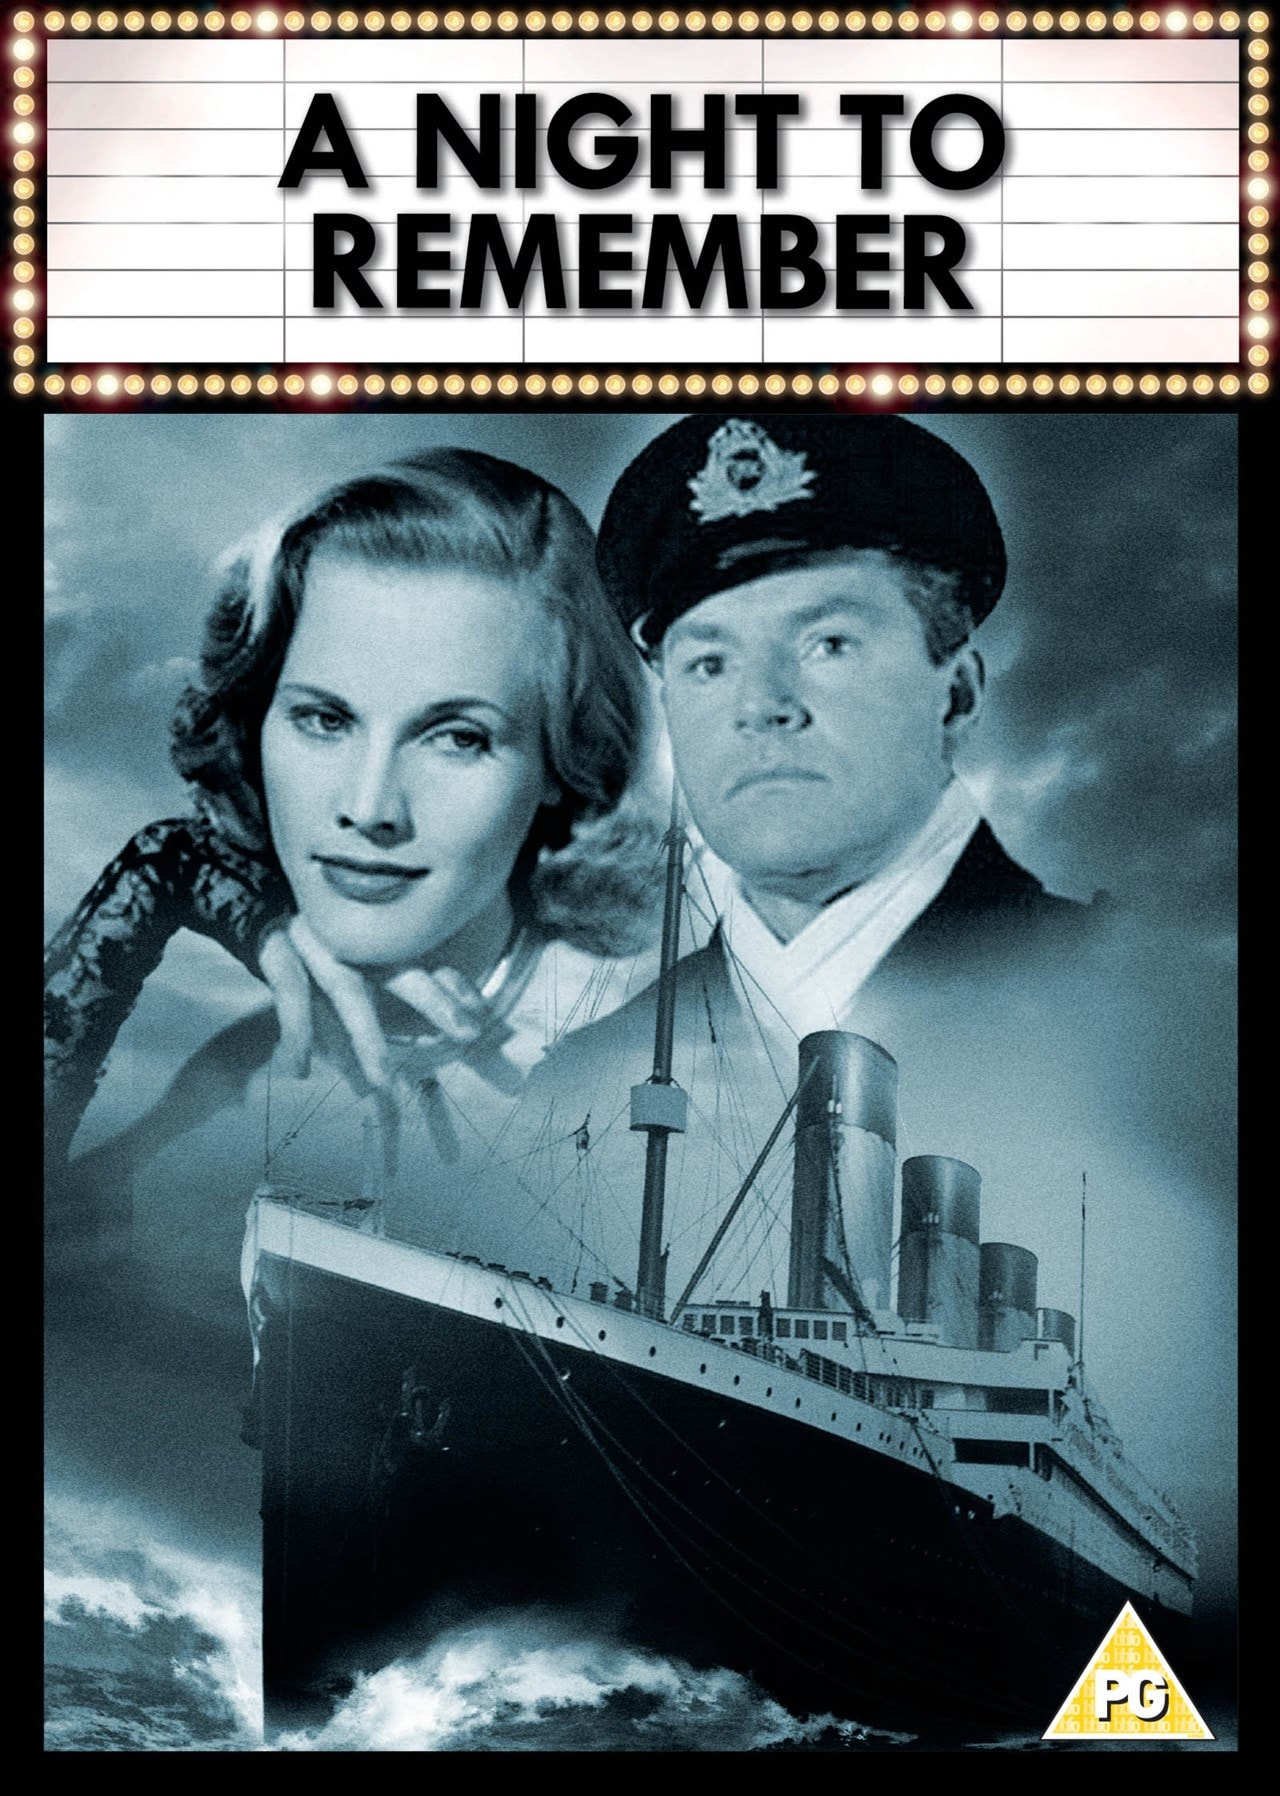 A Night to Remember - British Classics (hmv Exclusive) - 1